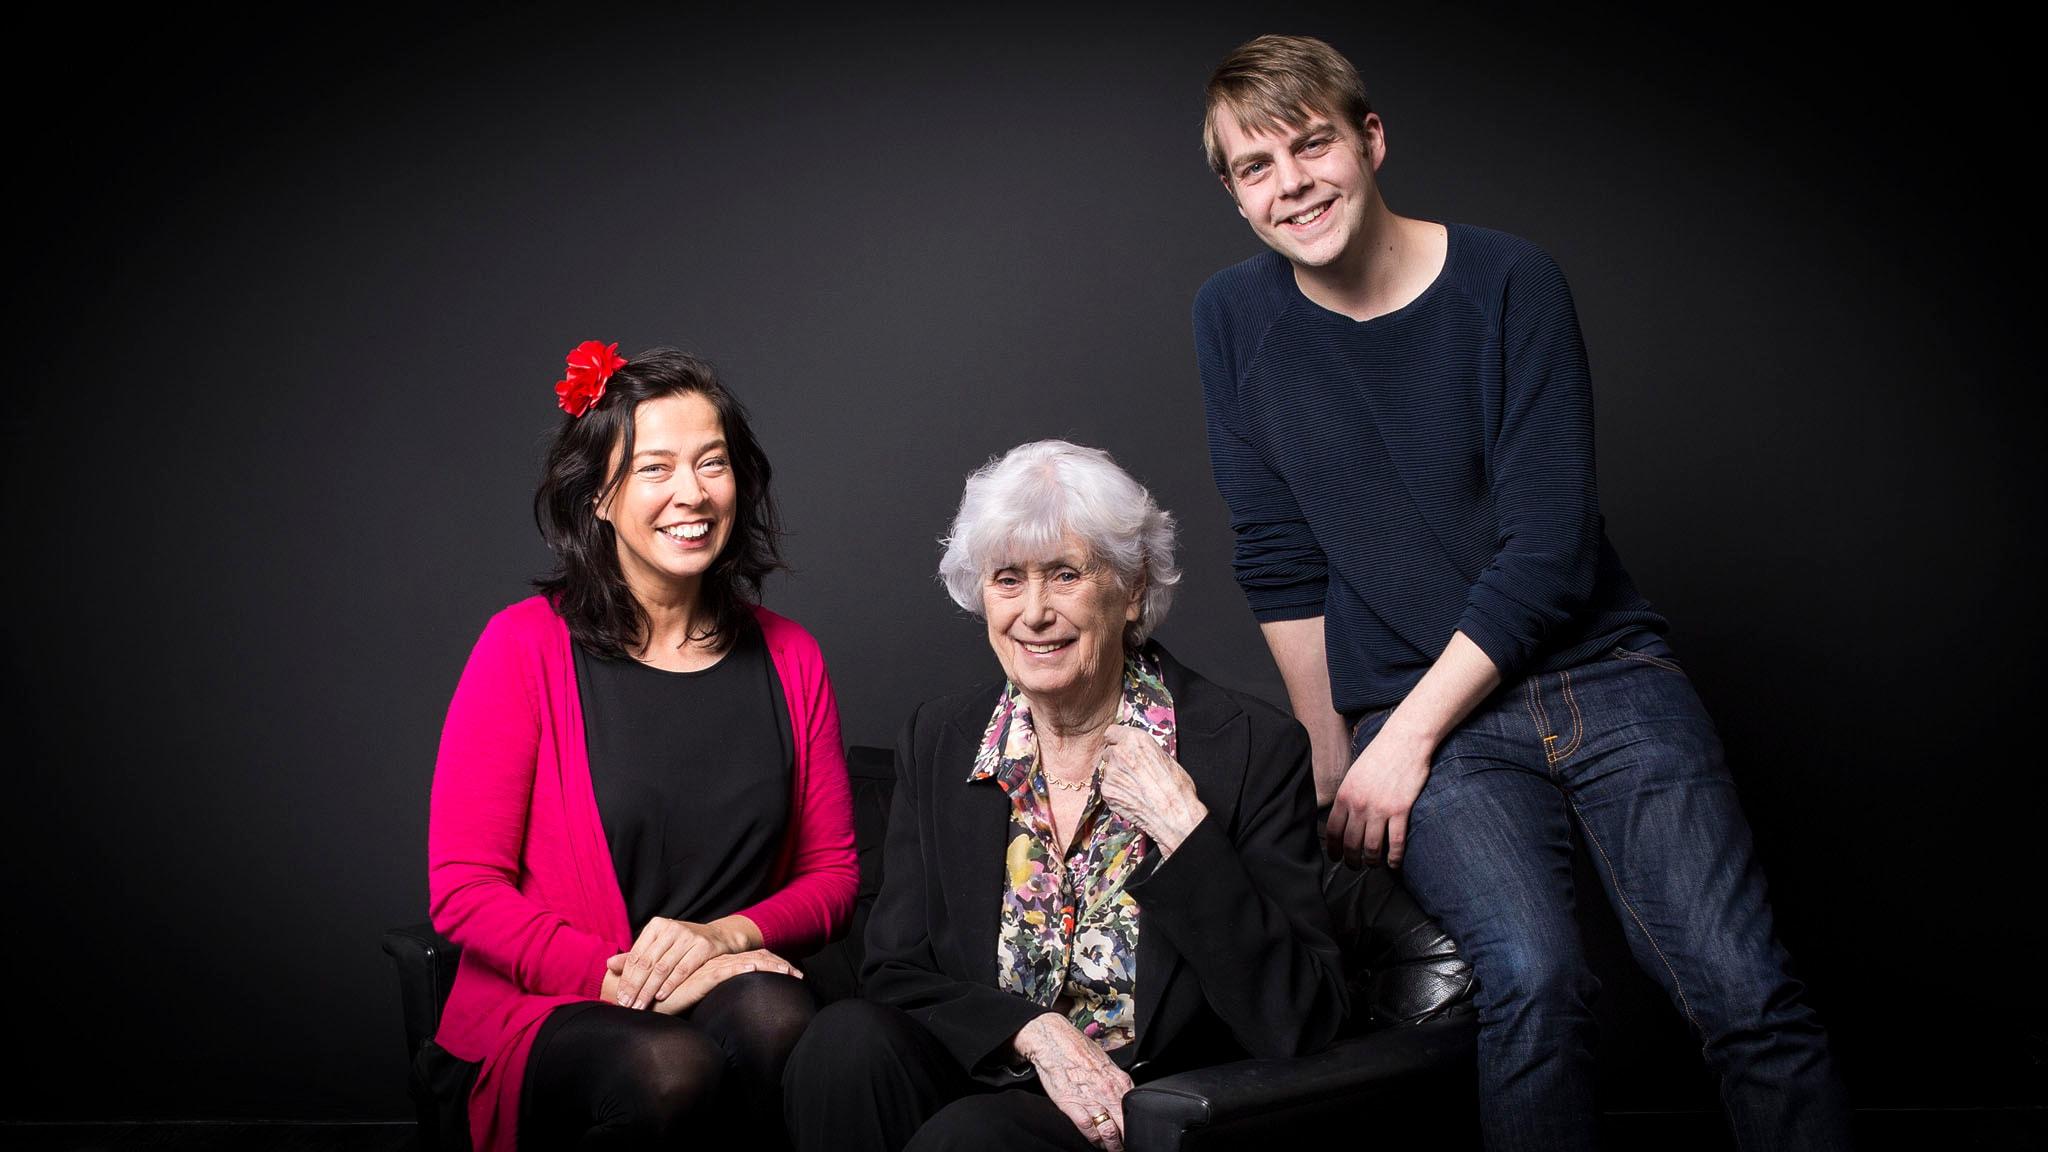 En trio som svänger - Marie Lundström, Kerstin Ekman och Christoffer Carlsson. Foto: Mikael Grönberg, SR.